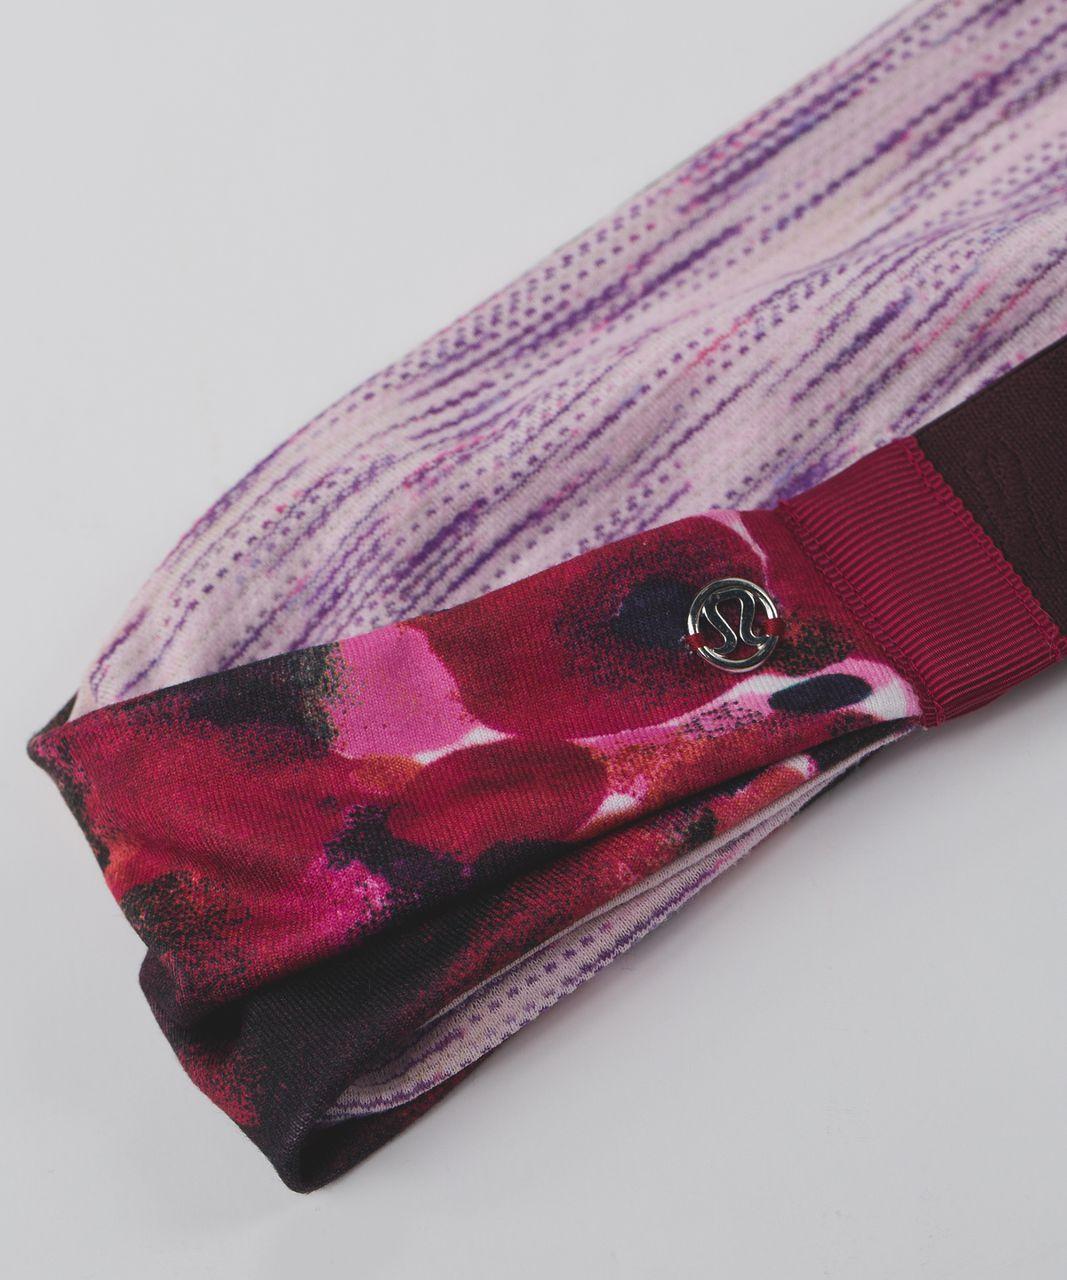 Lululemon Fringe Fighter Headband - Poppy Petals Berry Rumble Multi / Tiger Space Dye Tender Violet Powdered Rose